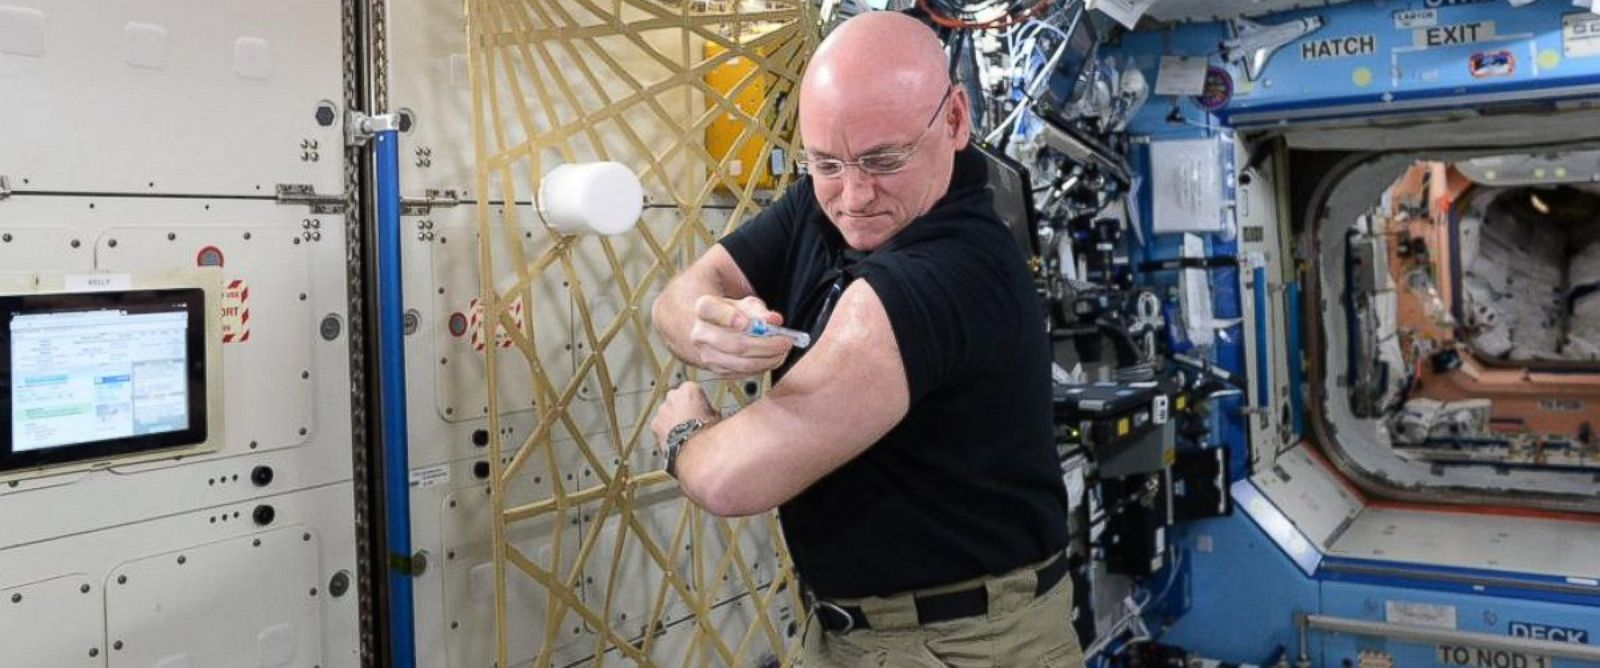 Flu Shots Go Zero-Gravity for NASA Research - ABC News